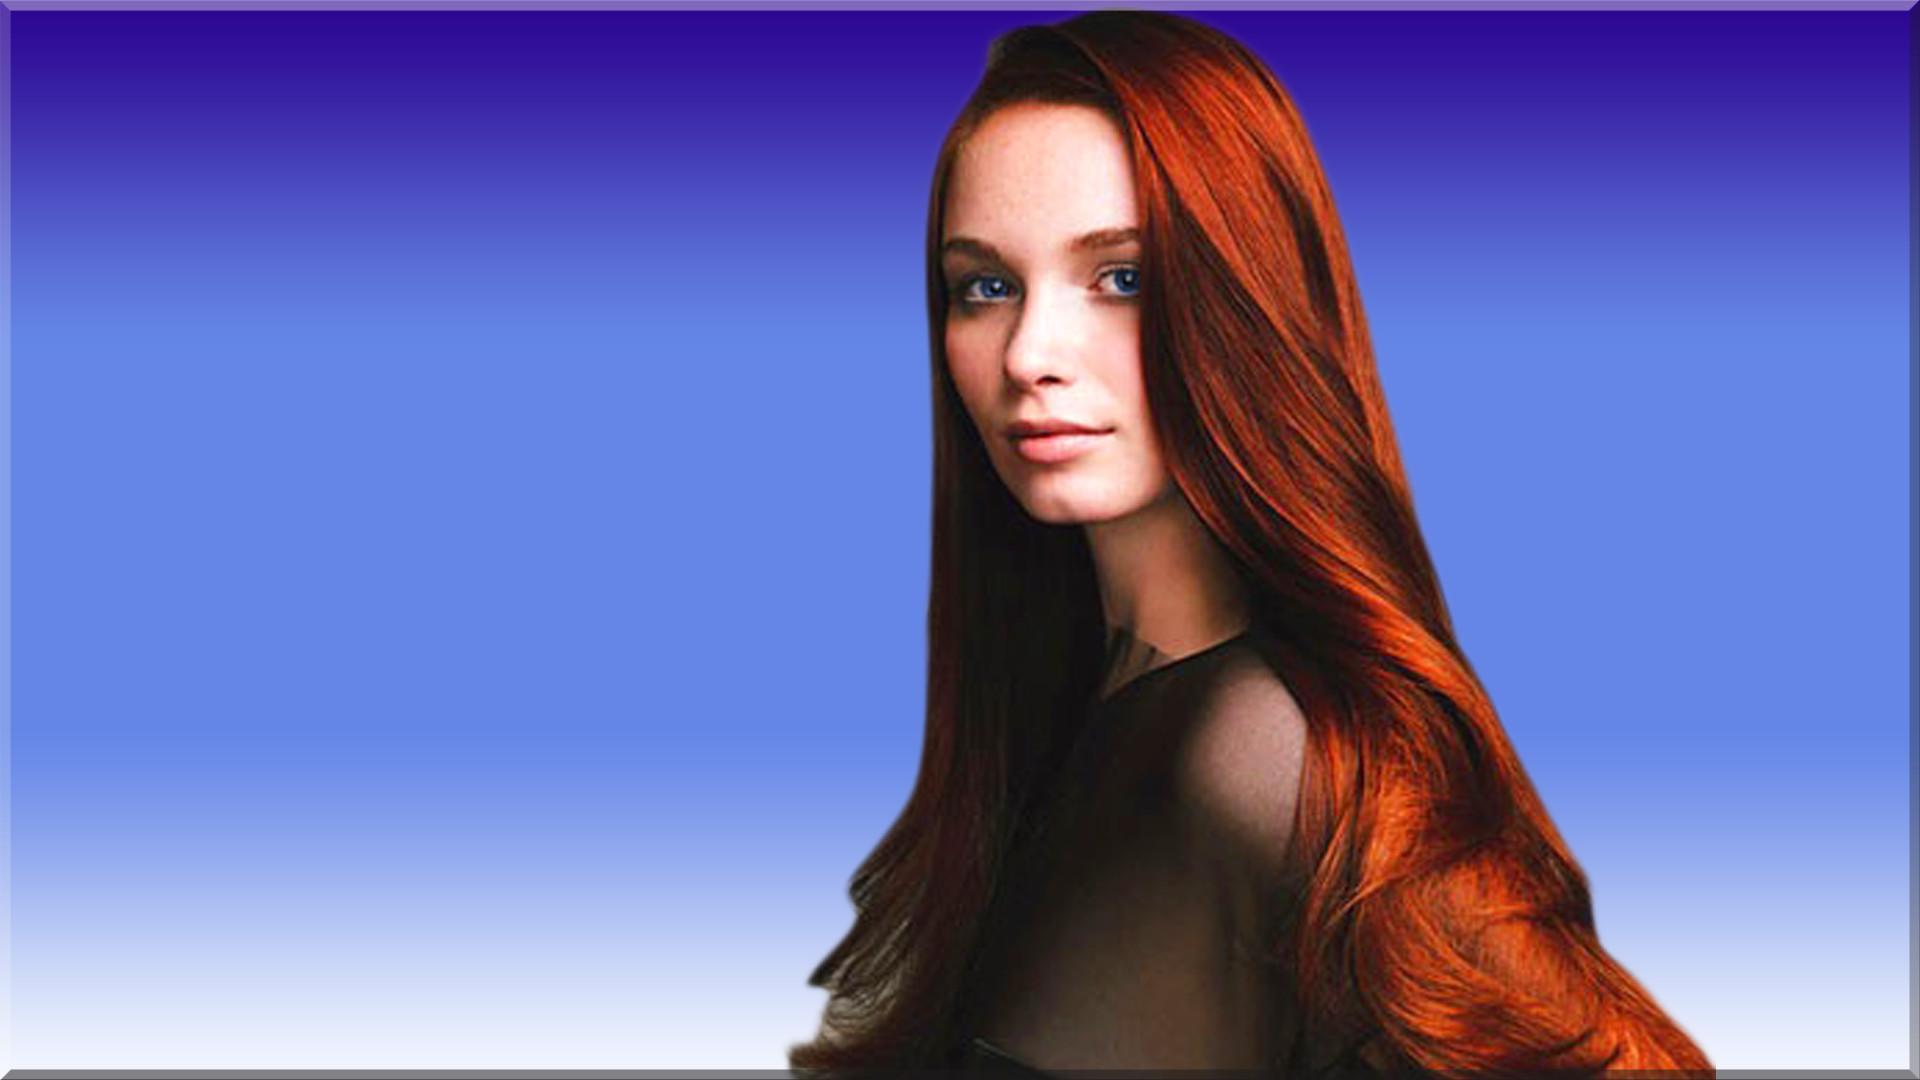 Gorgeous Model Wallpaper by Omar Monroy, BsnSCB Gallery   Celebrities 4K  Ultra HD